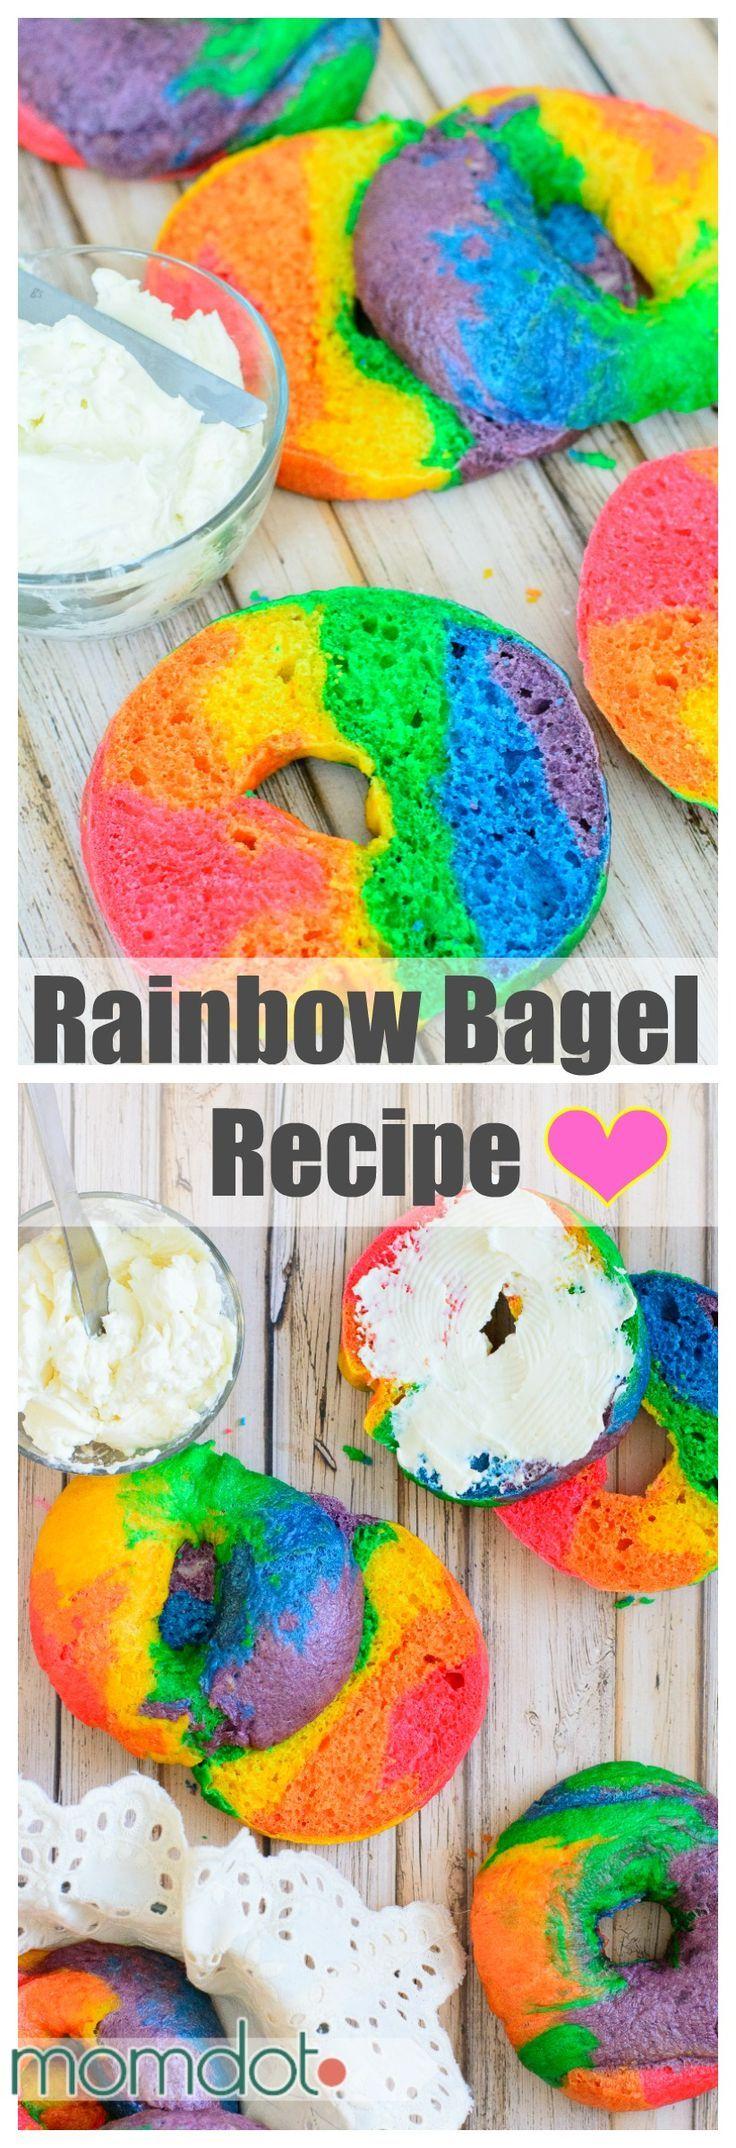 Rainbow Bagel Recipe: How to make Rainbow Bagels!